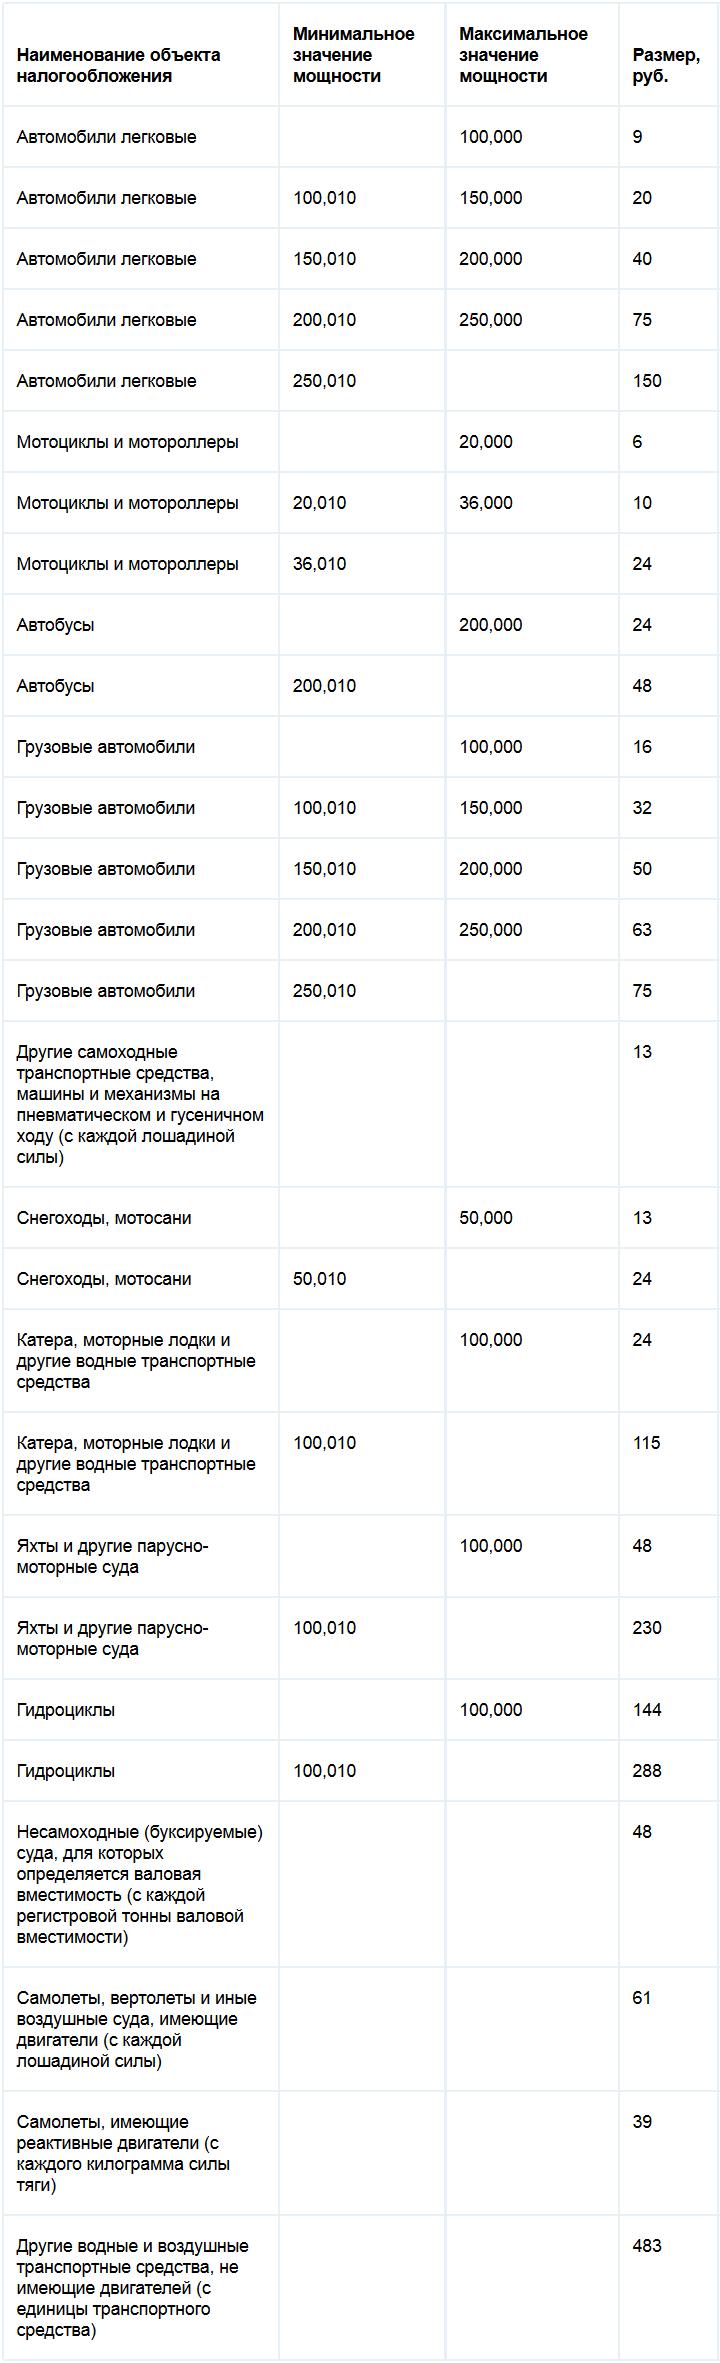 Транспортный налог татарстан 2014 ставки прогнозы на нхл ставки